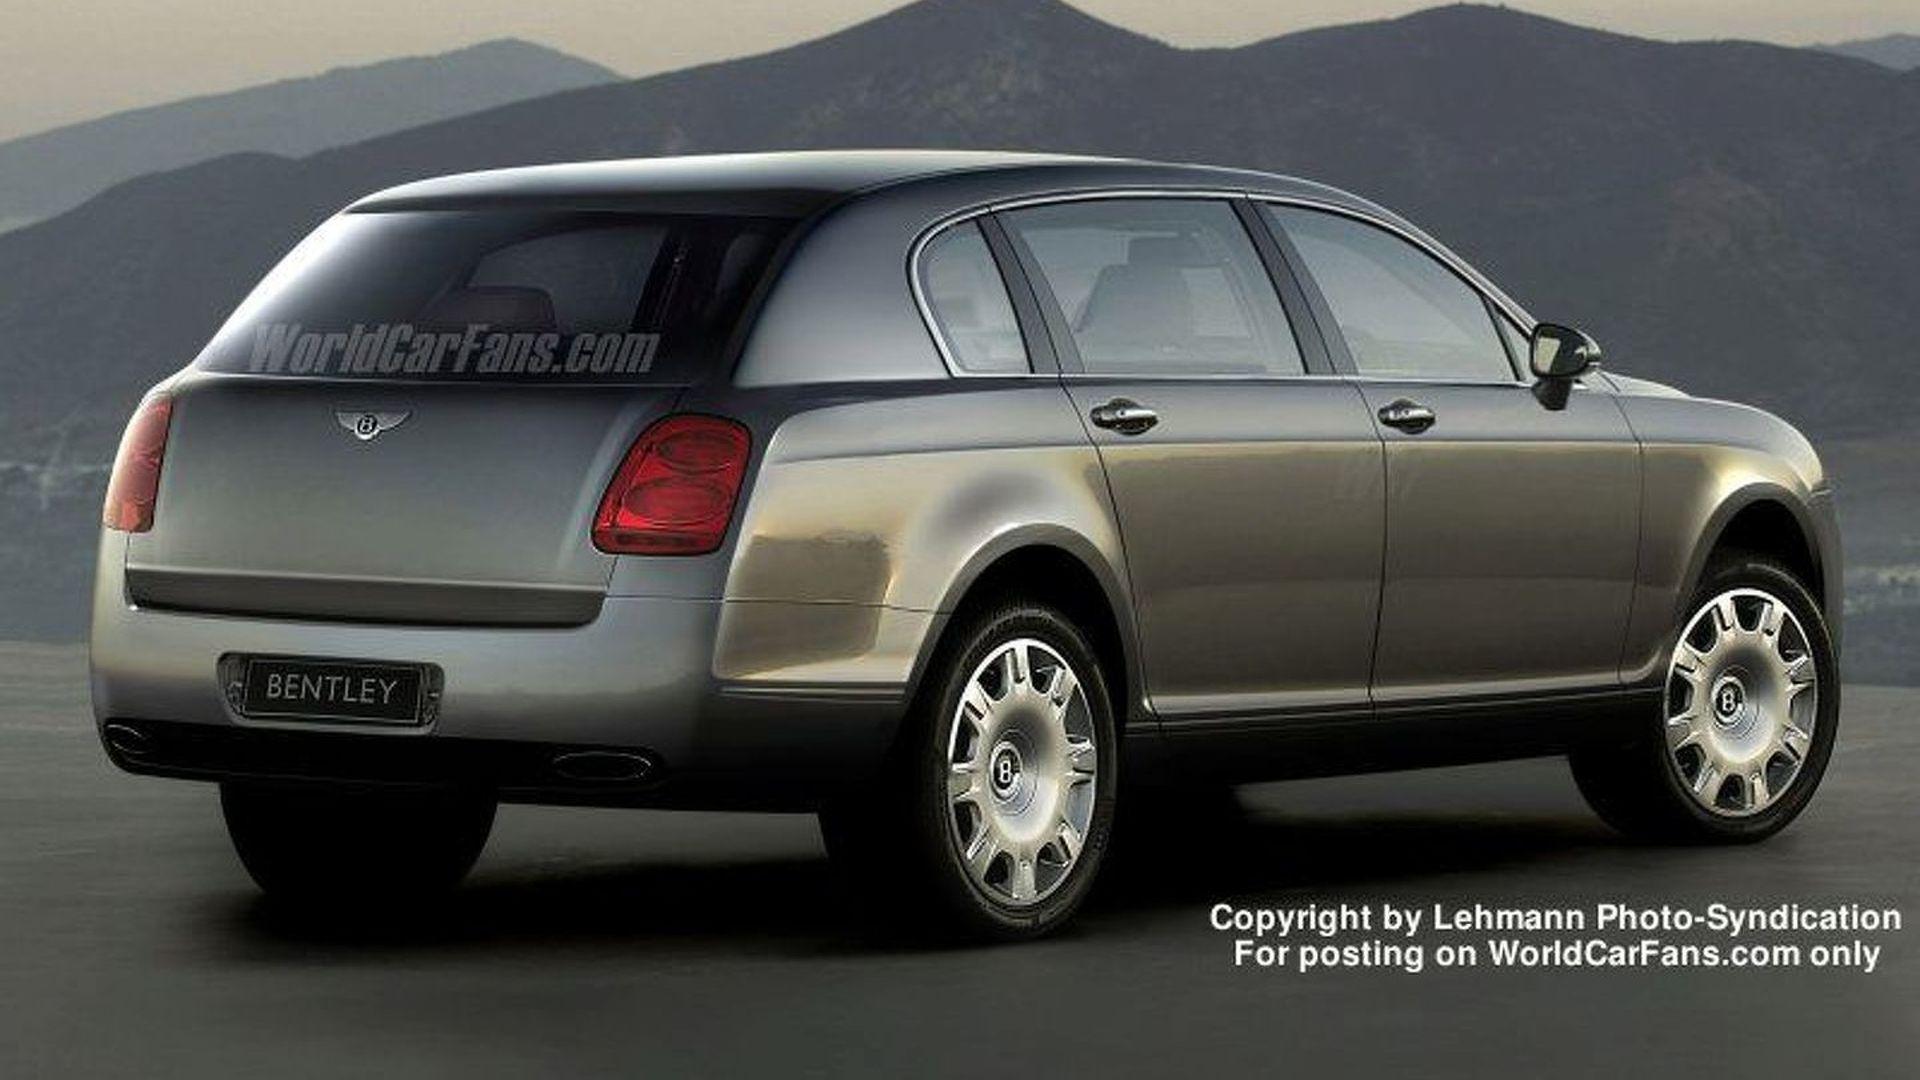 Spy Photos More New Bentley 4x4